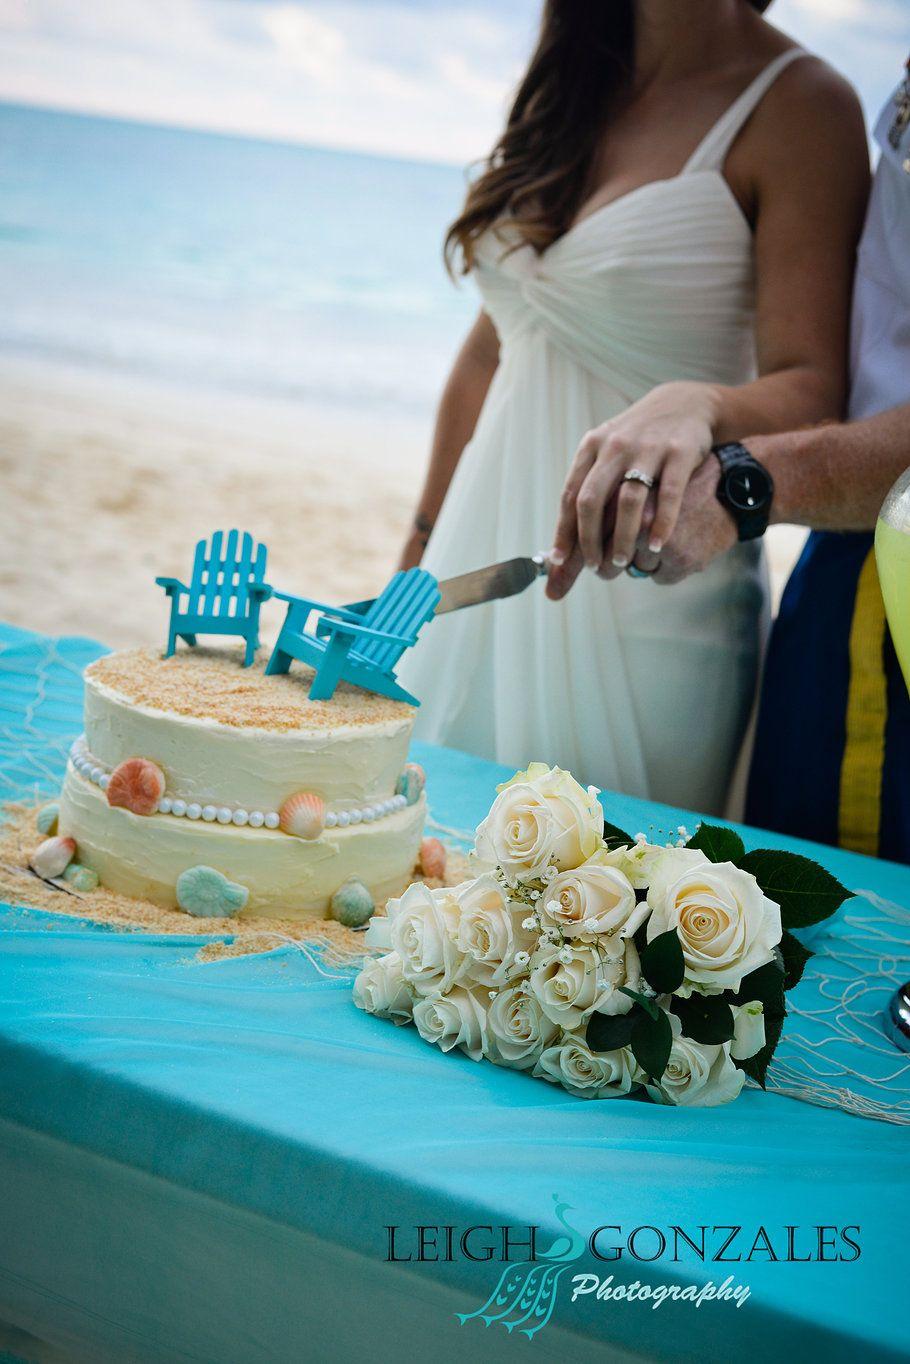 invitations wedding renewal vows ceremony%0A Marriage vows